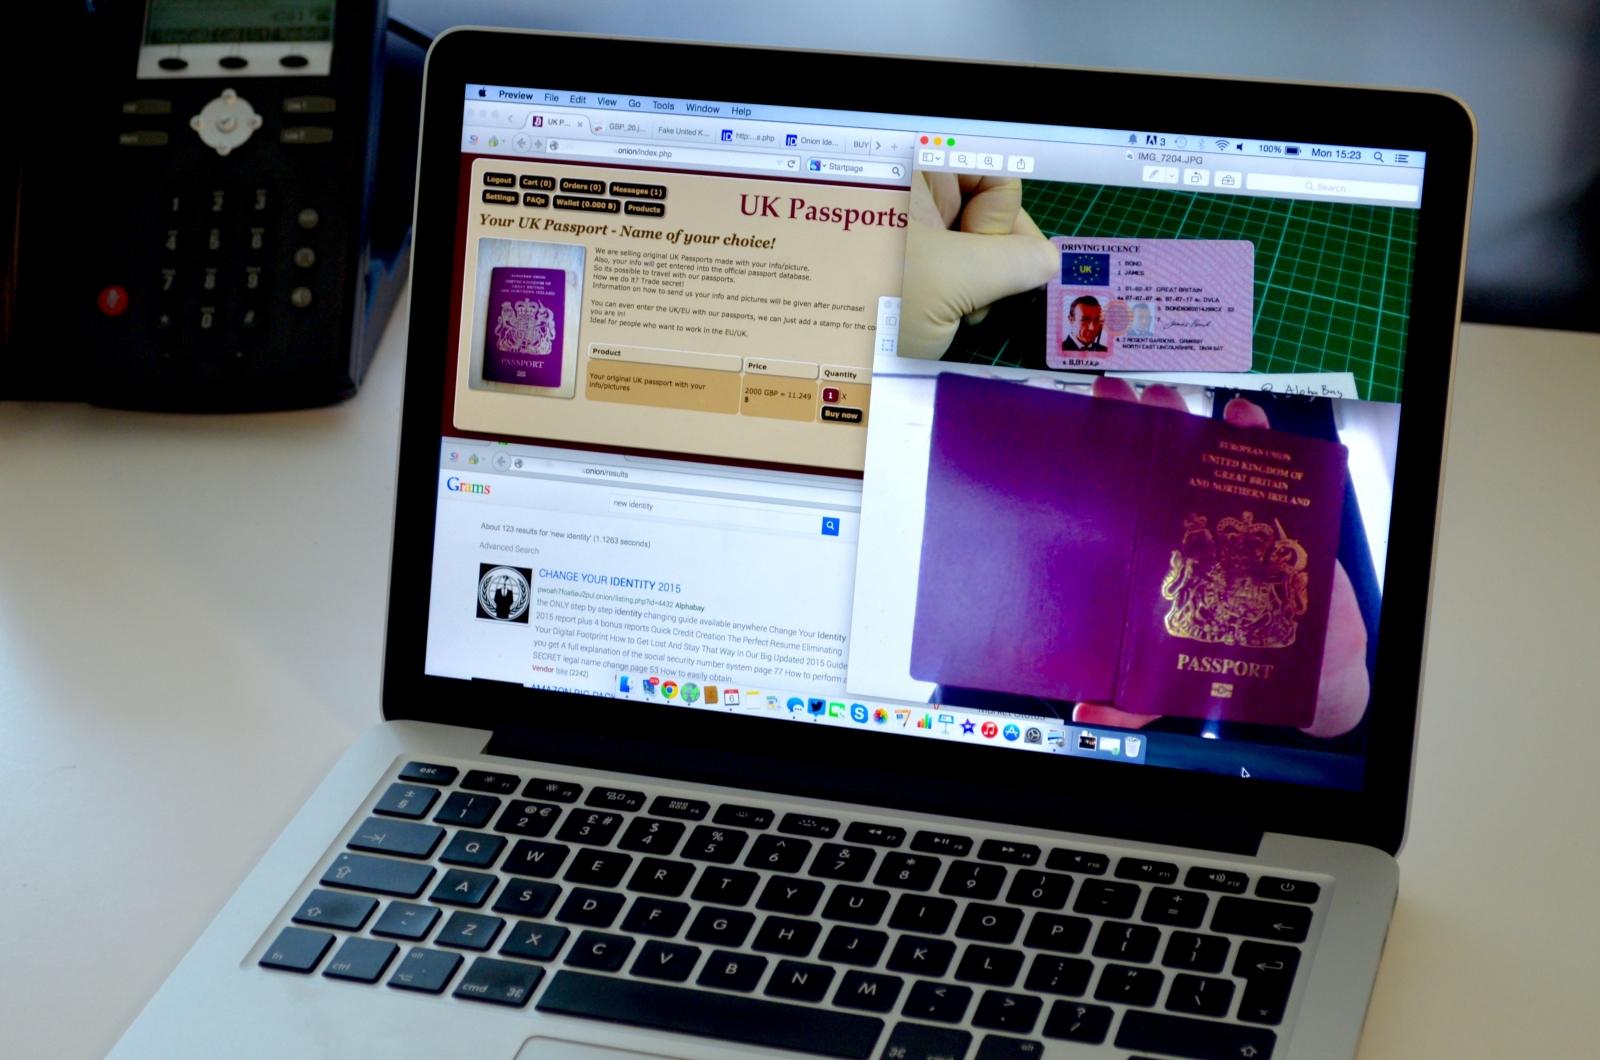 Dark web passports for sale